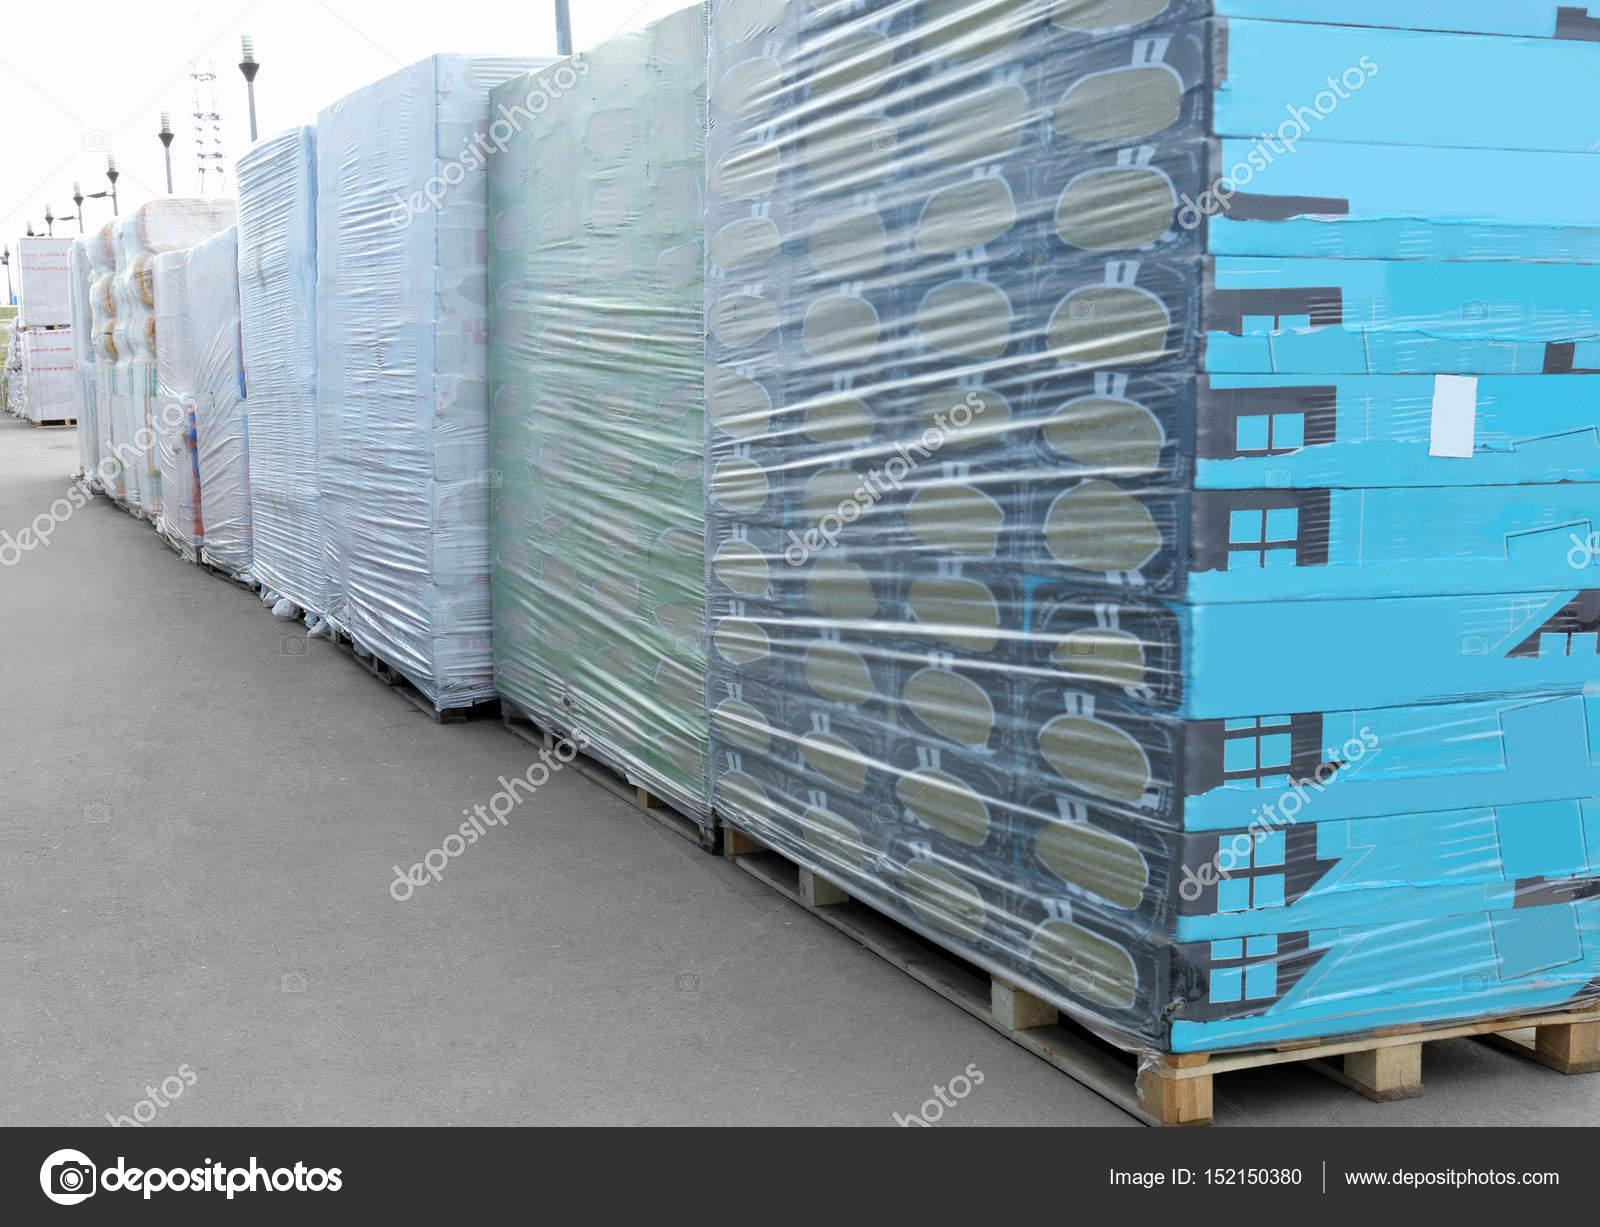 2b49c4b9a530 Πακέτα με εμπορευμάτων για χονδρική πώληση — Φωτογραφία Αρχείου ...